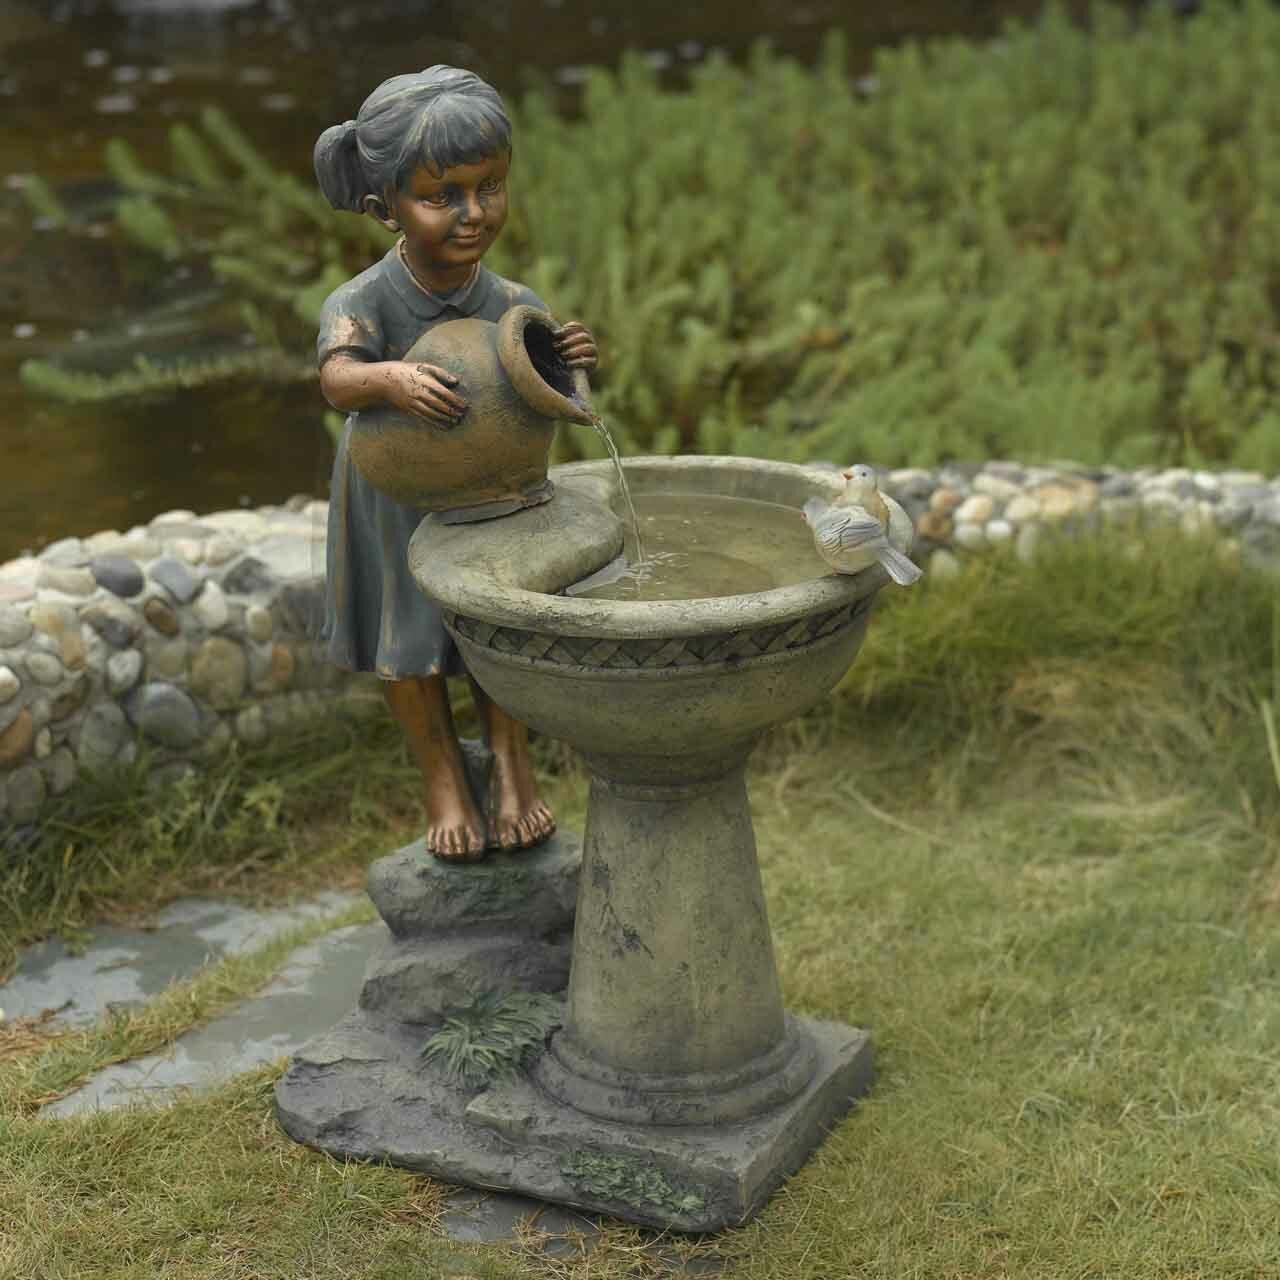 country Girl kid garden SOLAR light Outdoor rustic lamp STATUE Bird feeder bath